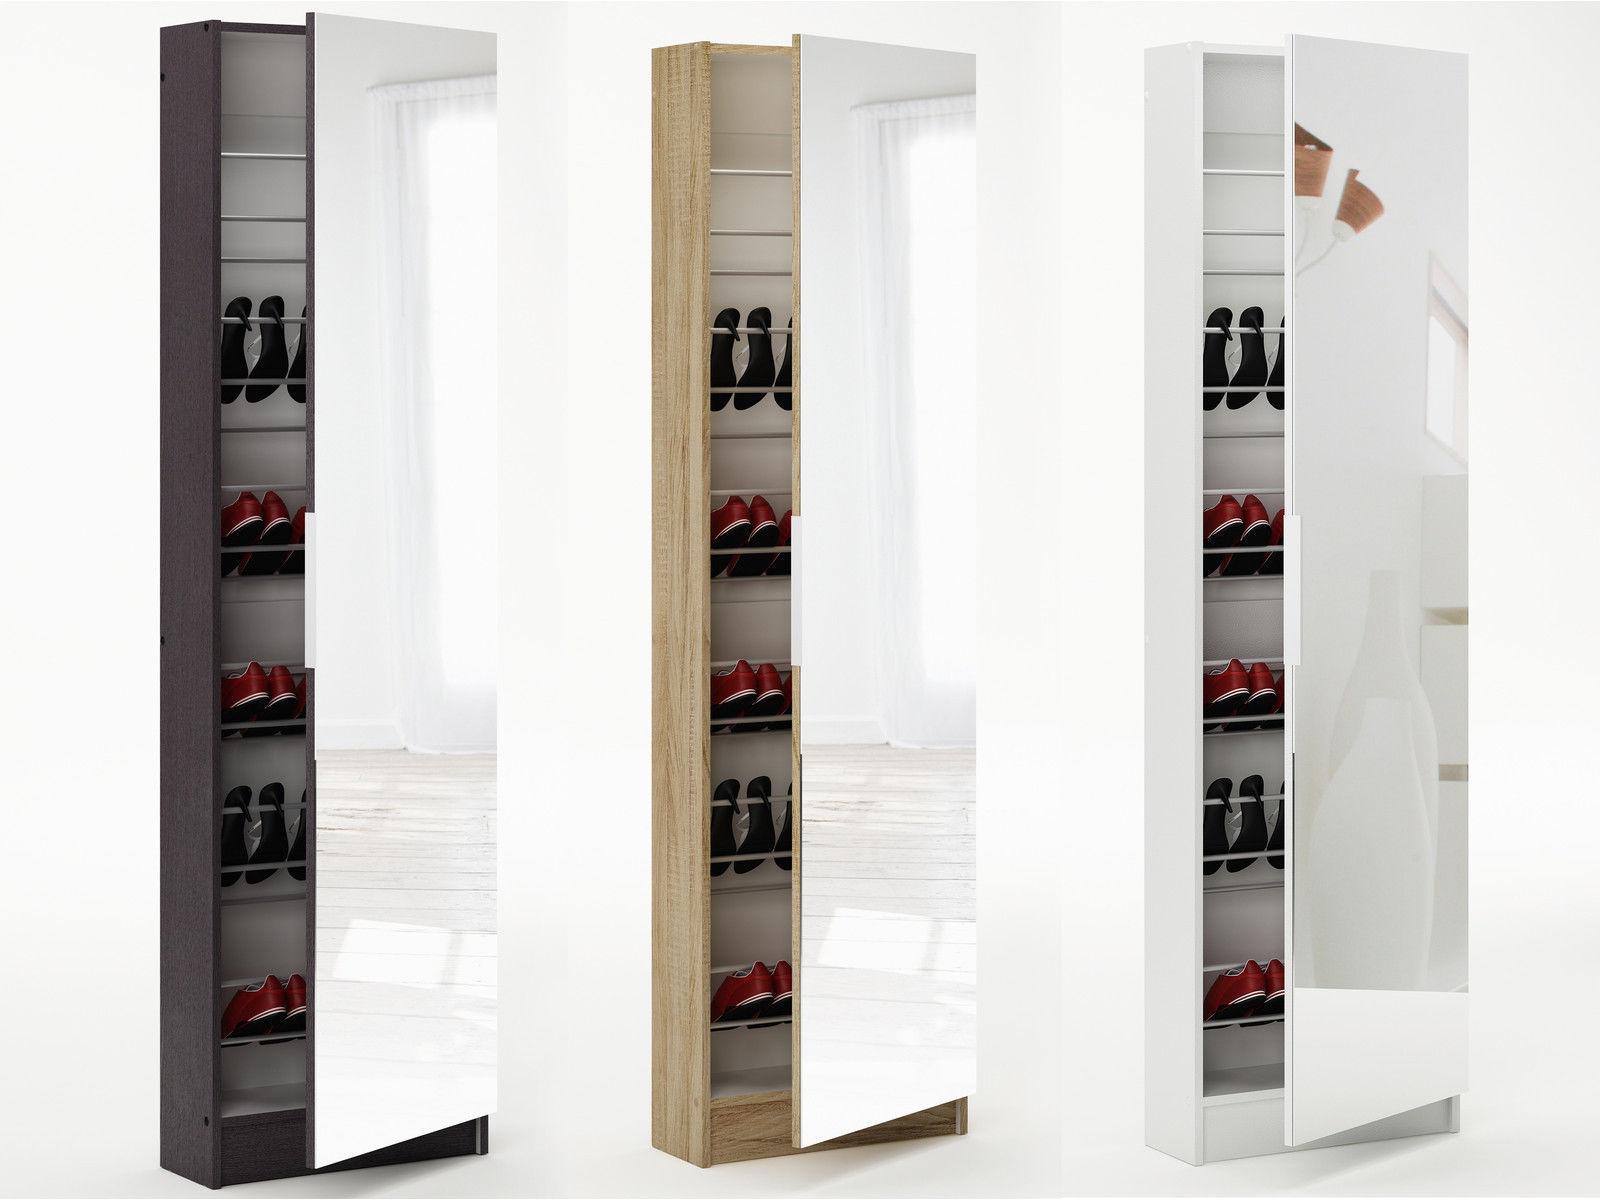 6ft Mirrored Shoe Cabinet Storage 180cm 6 Tier